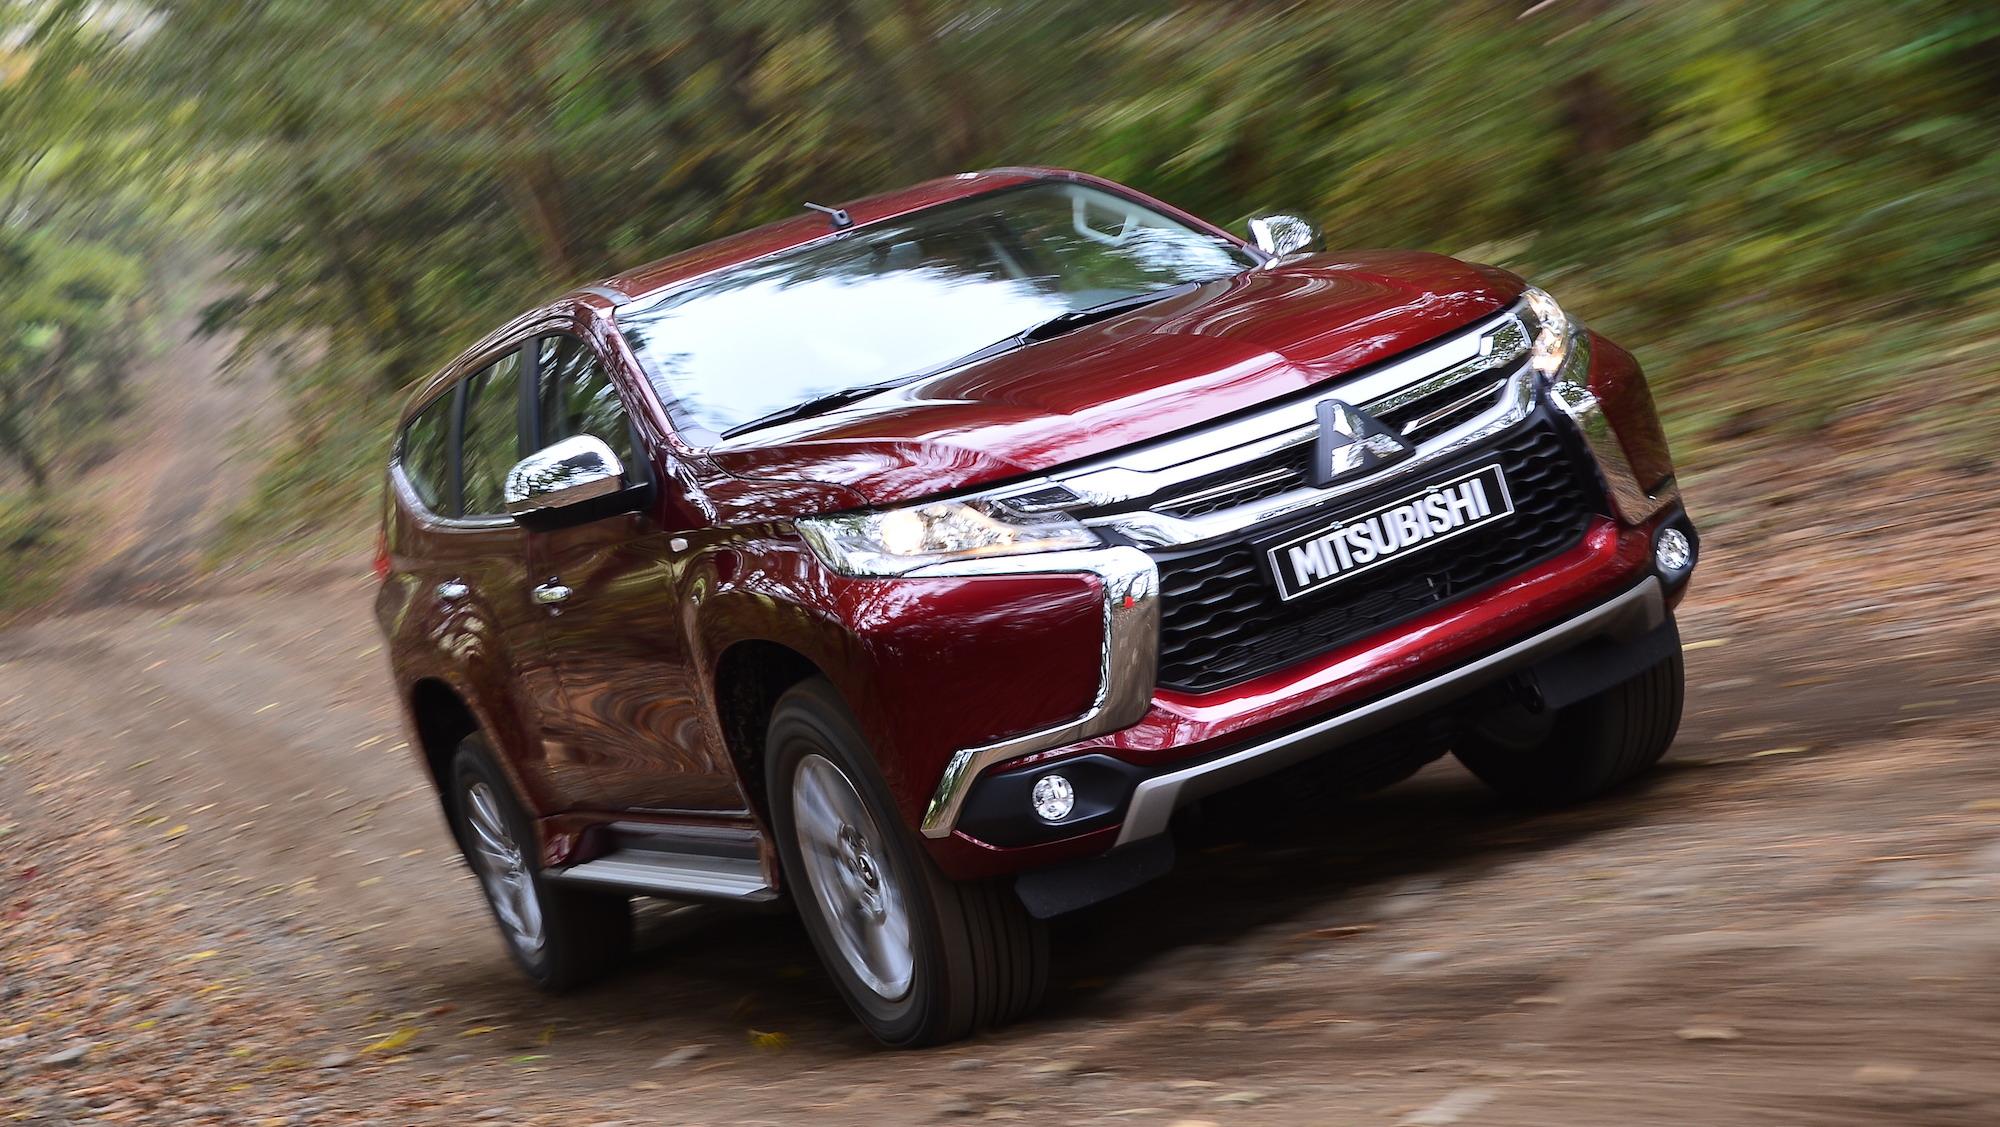 Mitsubishi Pajero Sport Review: Quick drive | CarAdvice